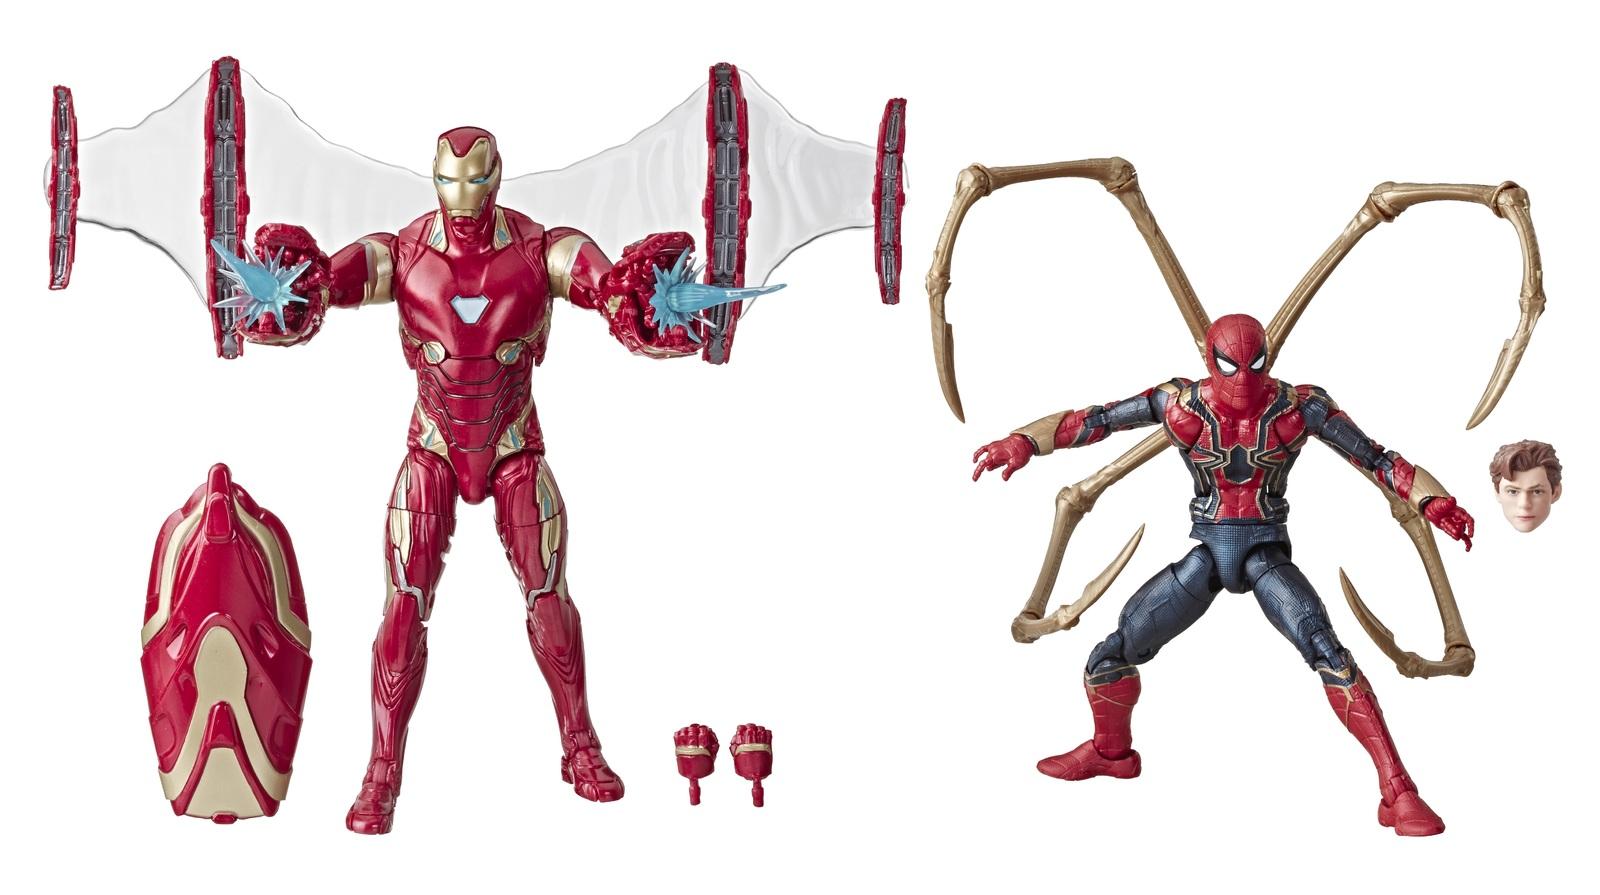 Marvel Legends: Action Figure 2-Pack - Iron-Man (Mark 50) & Iron Spider image